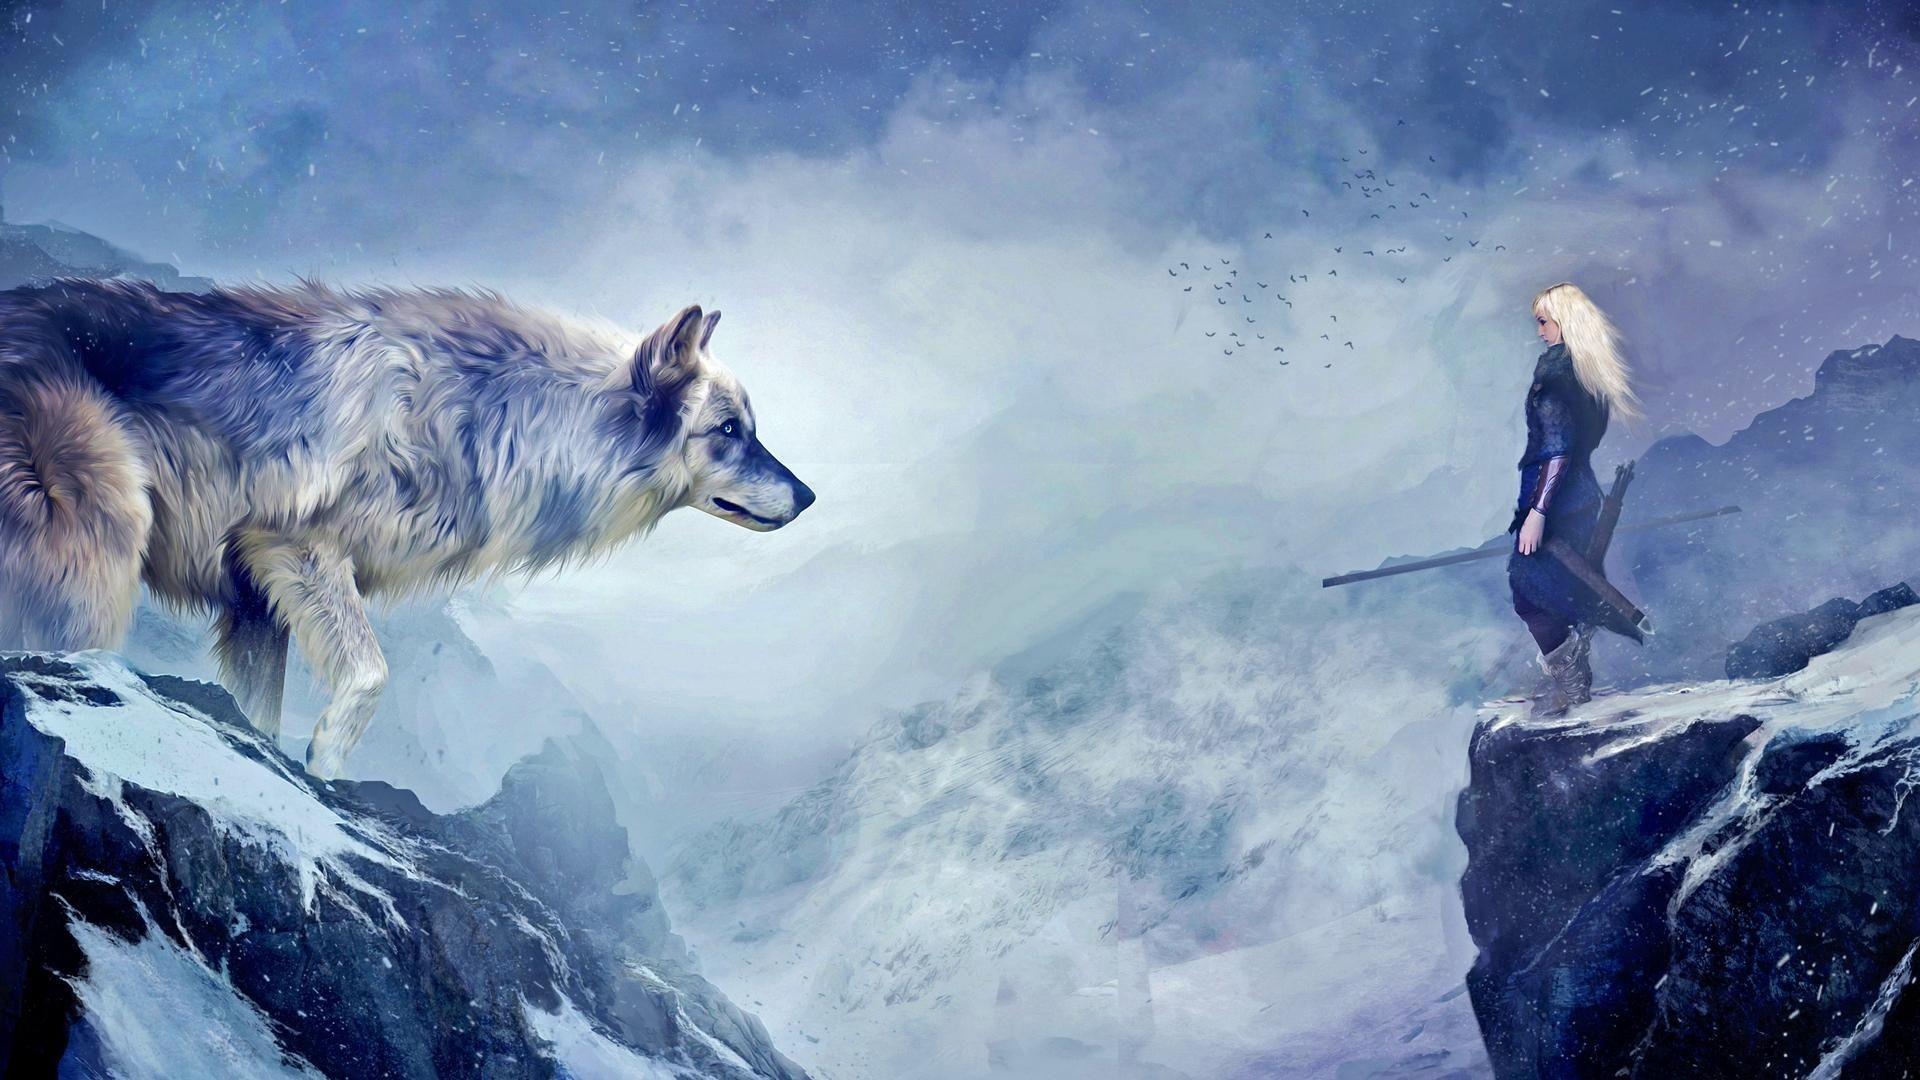 Fantasy Wolf Woman Warrior Mountain White Hair Wallpaper Art In 2019